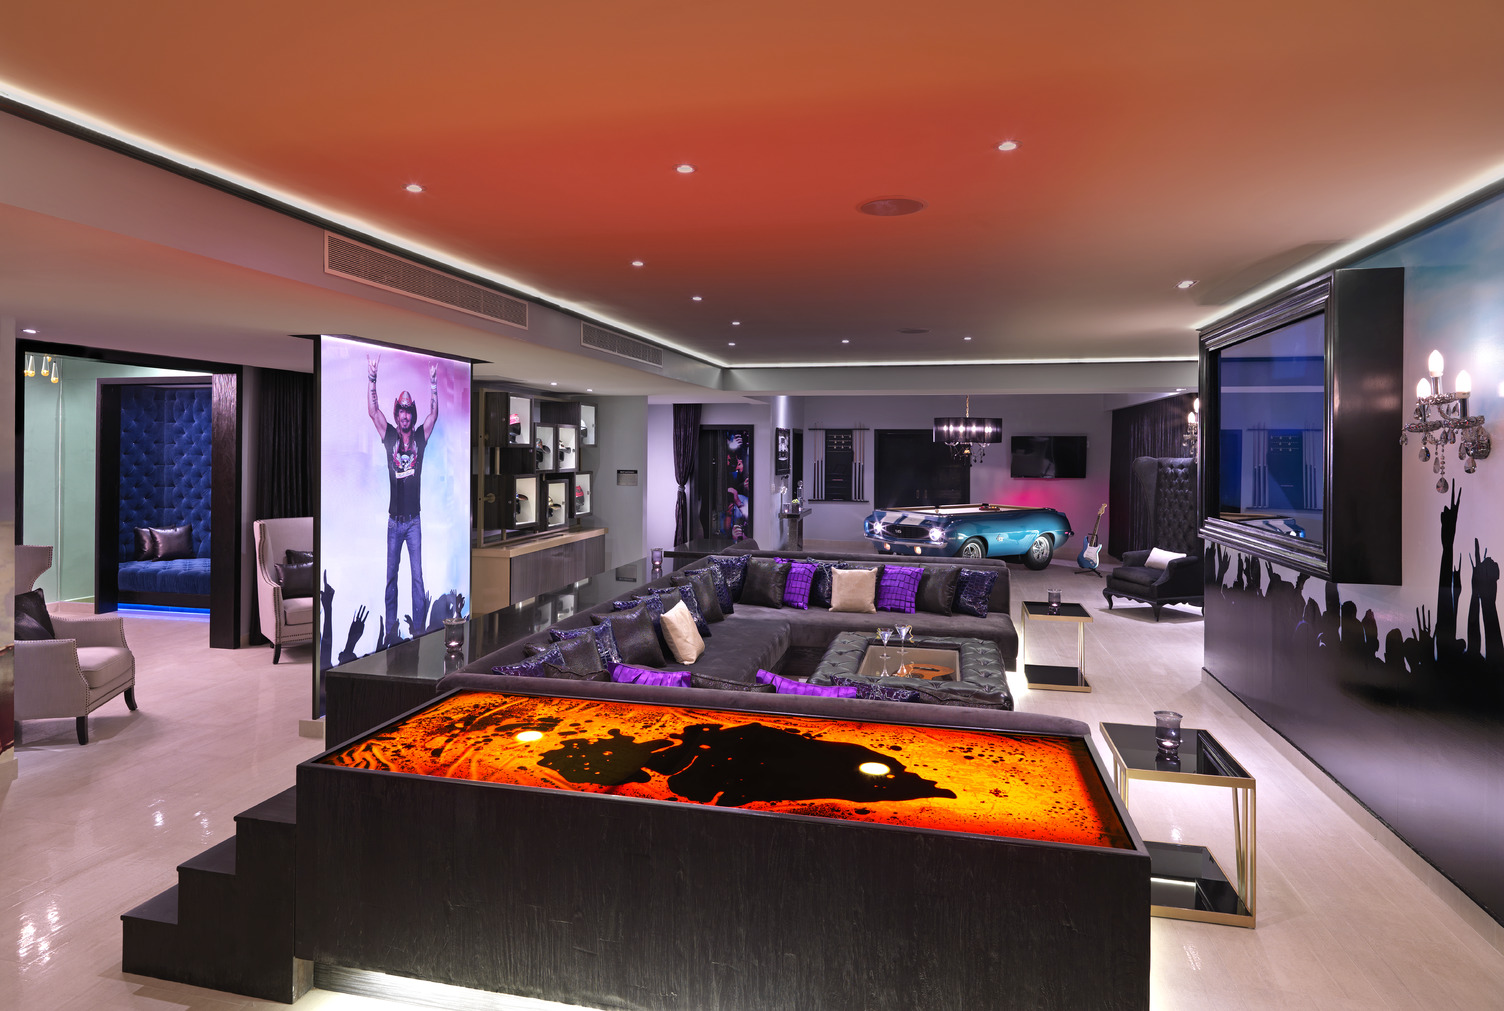 Travel Agency All-Inclusive Resort Heaven at Hard Rock Hotel Riviera Maya 56